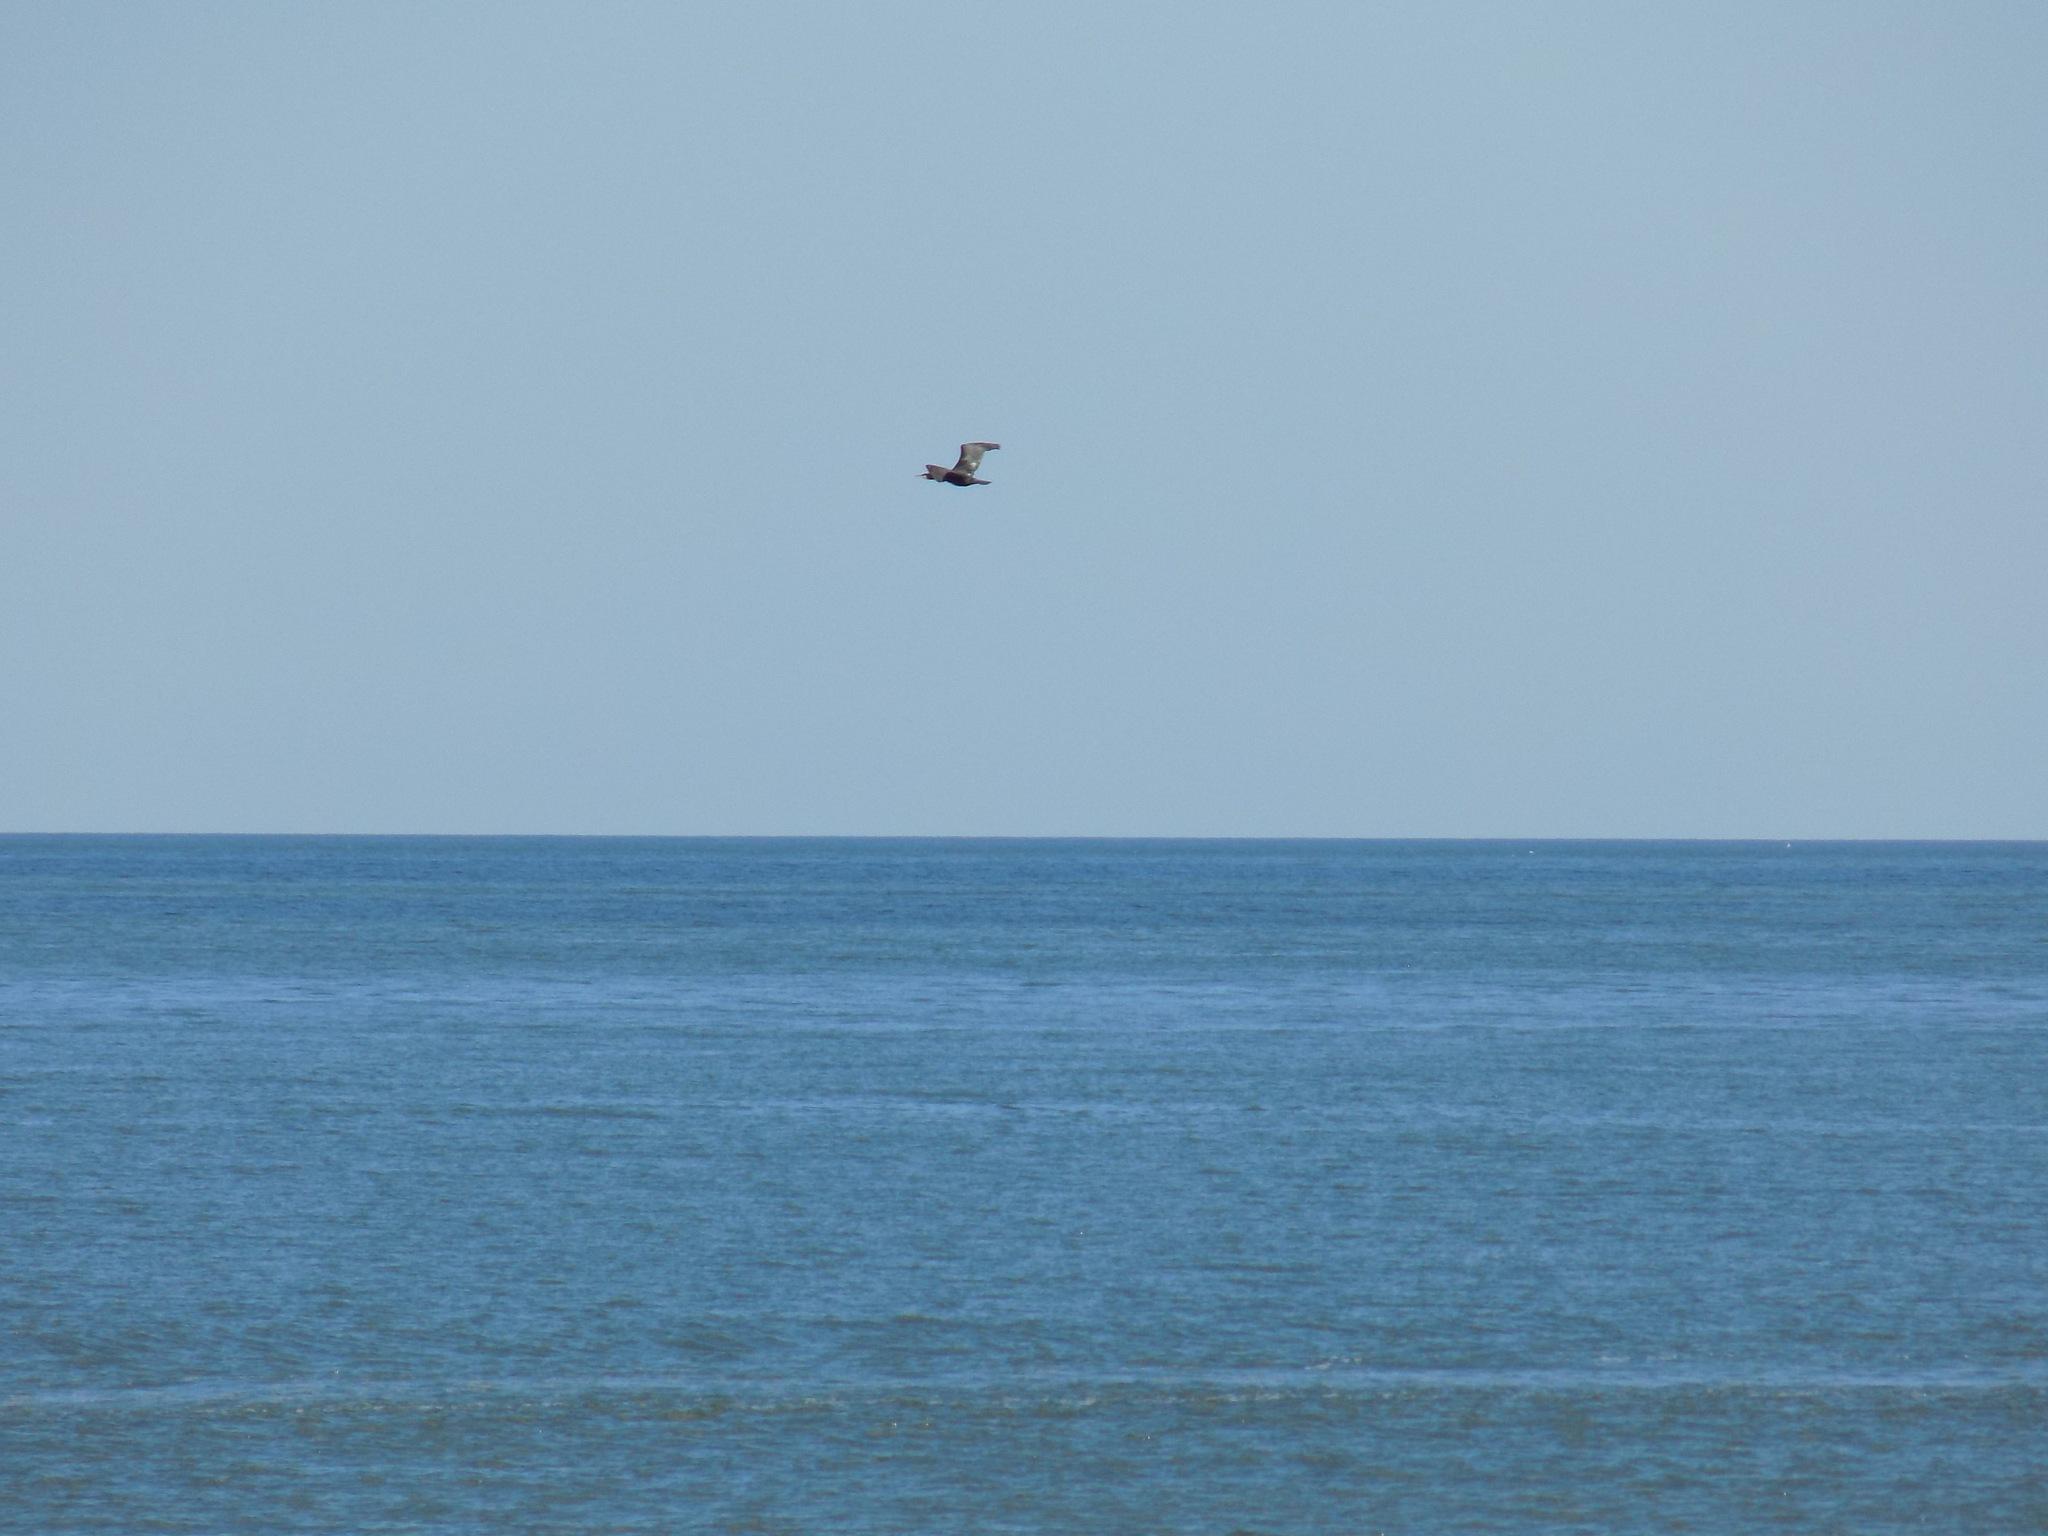 Bird over the sea by uzkuraitiene62